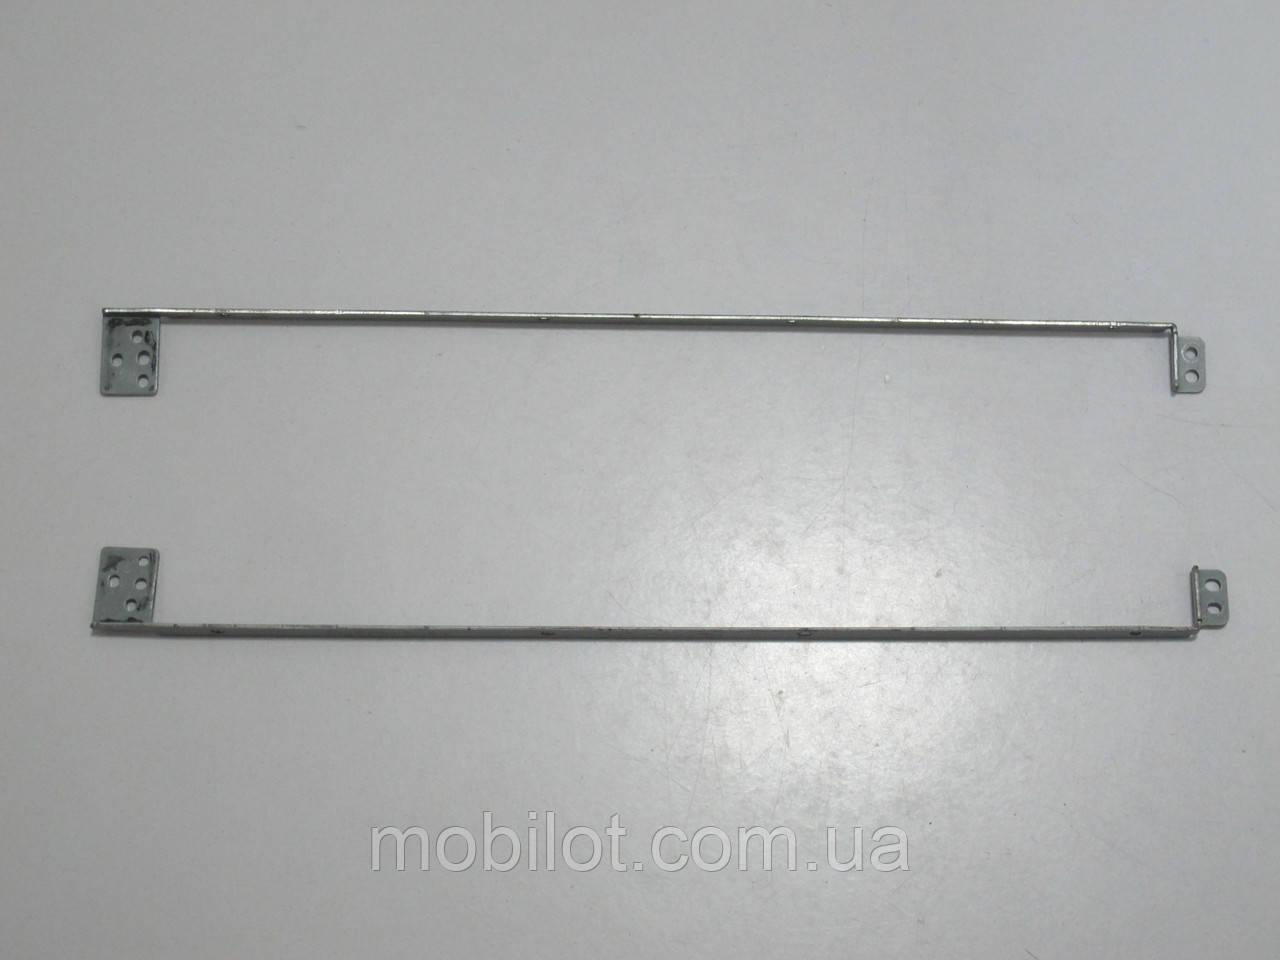 Направляющие Sony PCG-61611V VPCEE3E1R (NZ-4613)